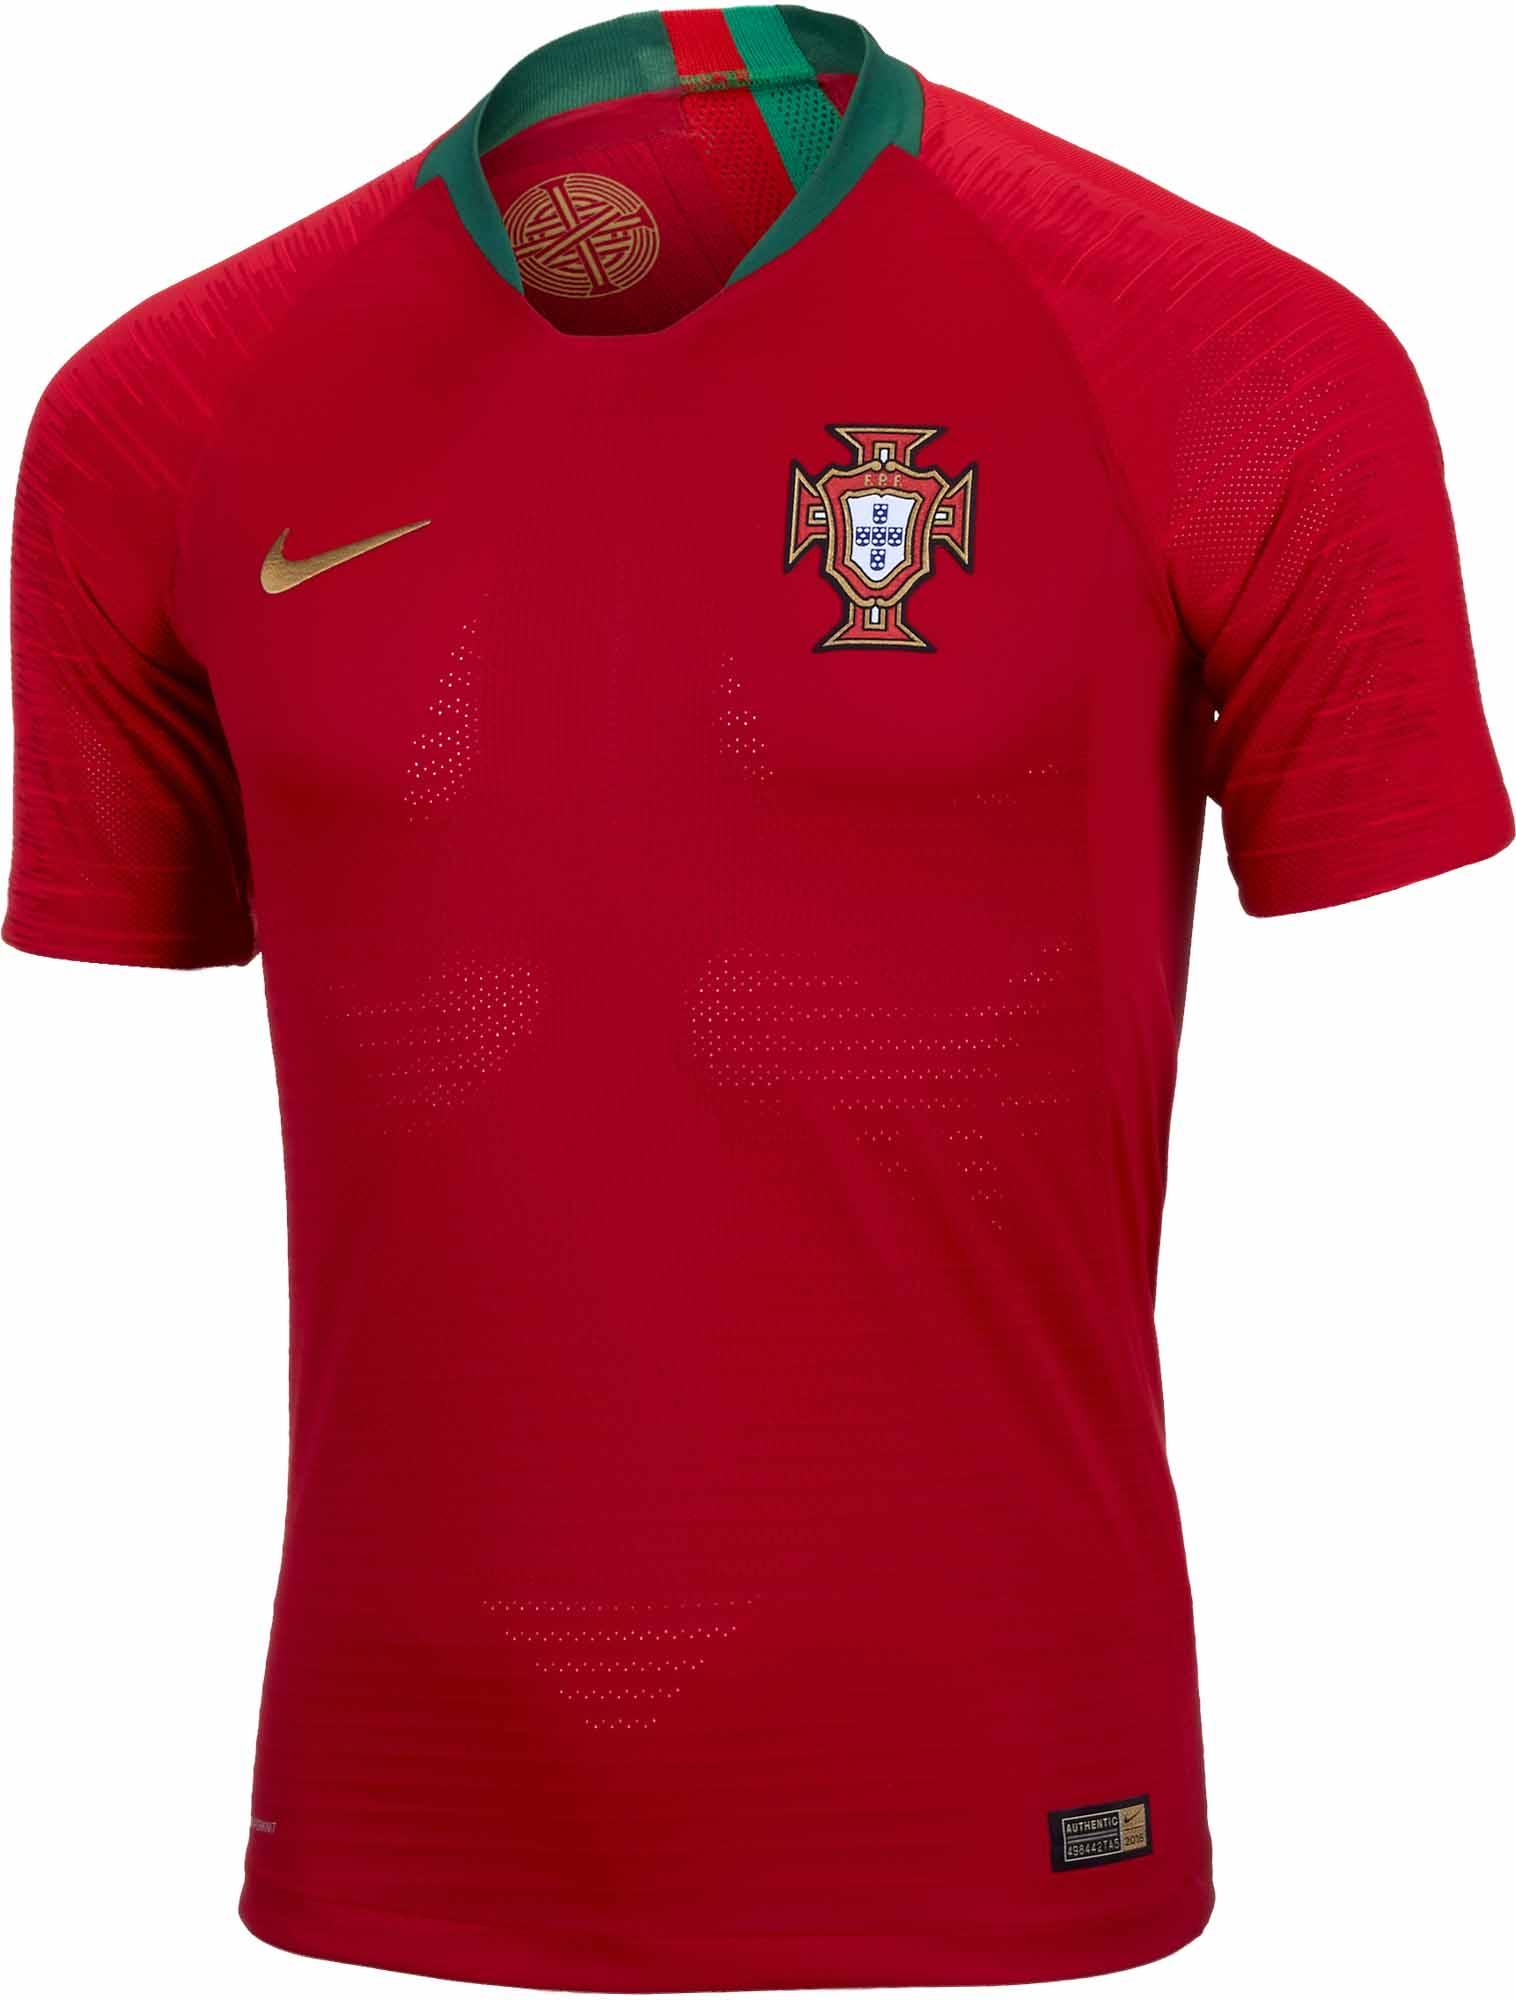 Nike Portugal Home Match Jersey 2018-19 - SoccerPro.com